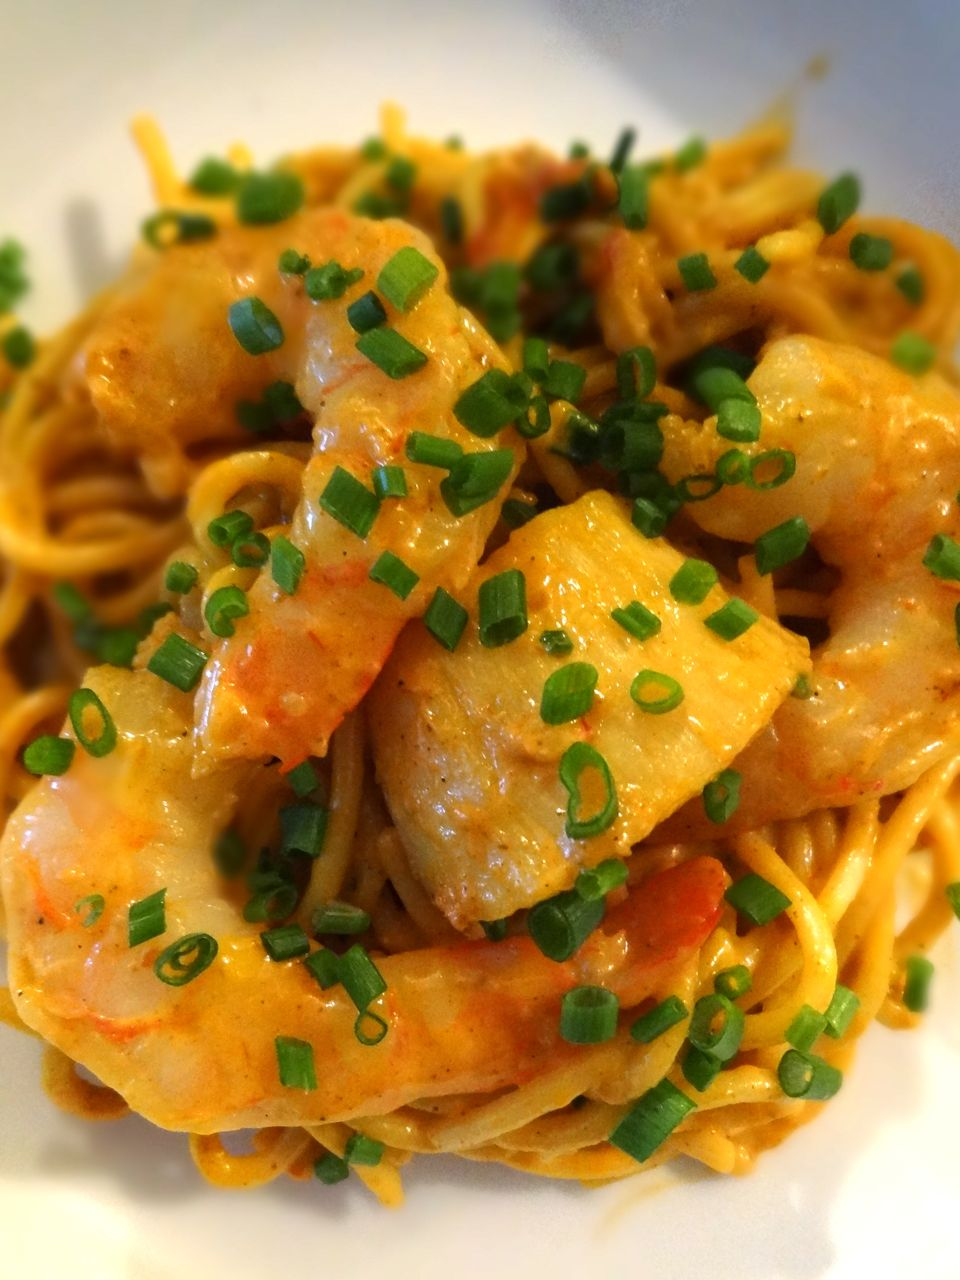 Scrumpdillyicious: Lobster, Shrimp & Scallop Newburg Pasta